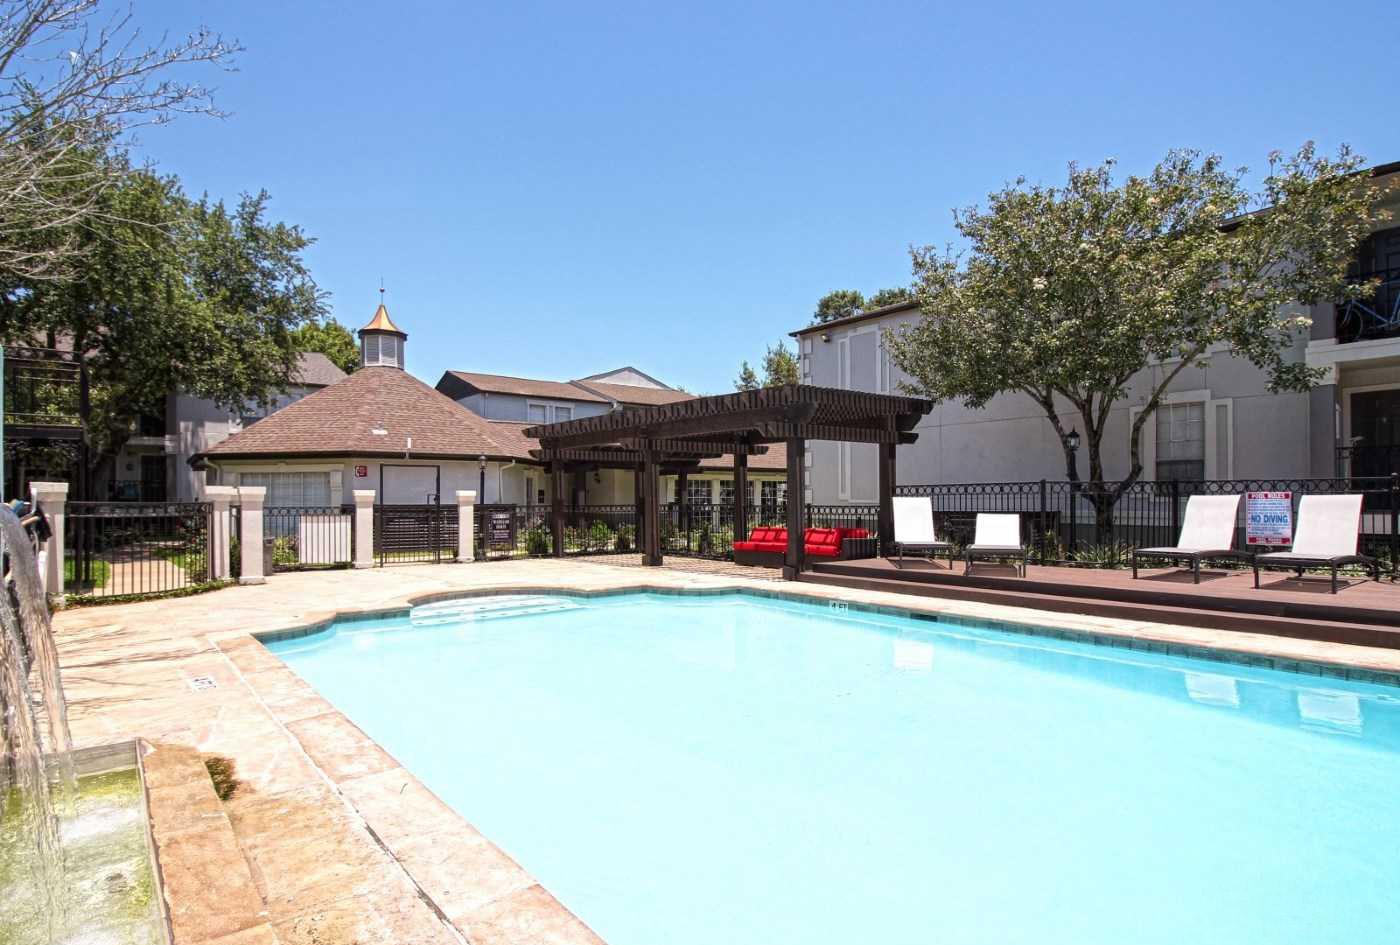 Gated Pool Area at La Maison at Lake Cove Apartments in Seabrook, Texas